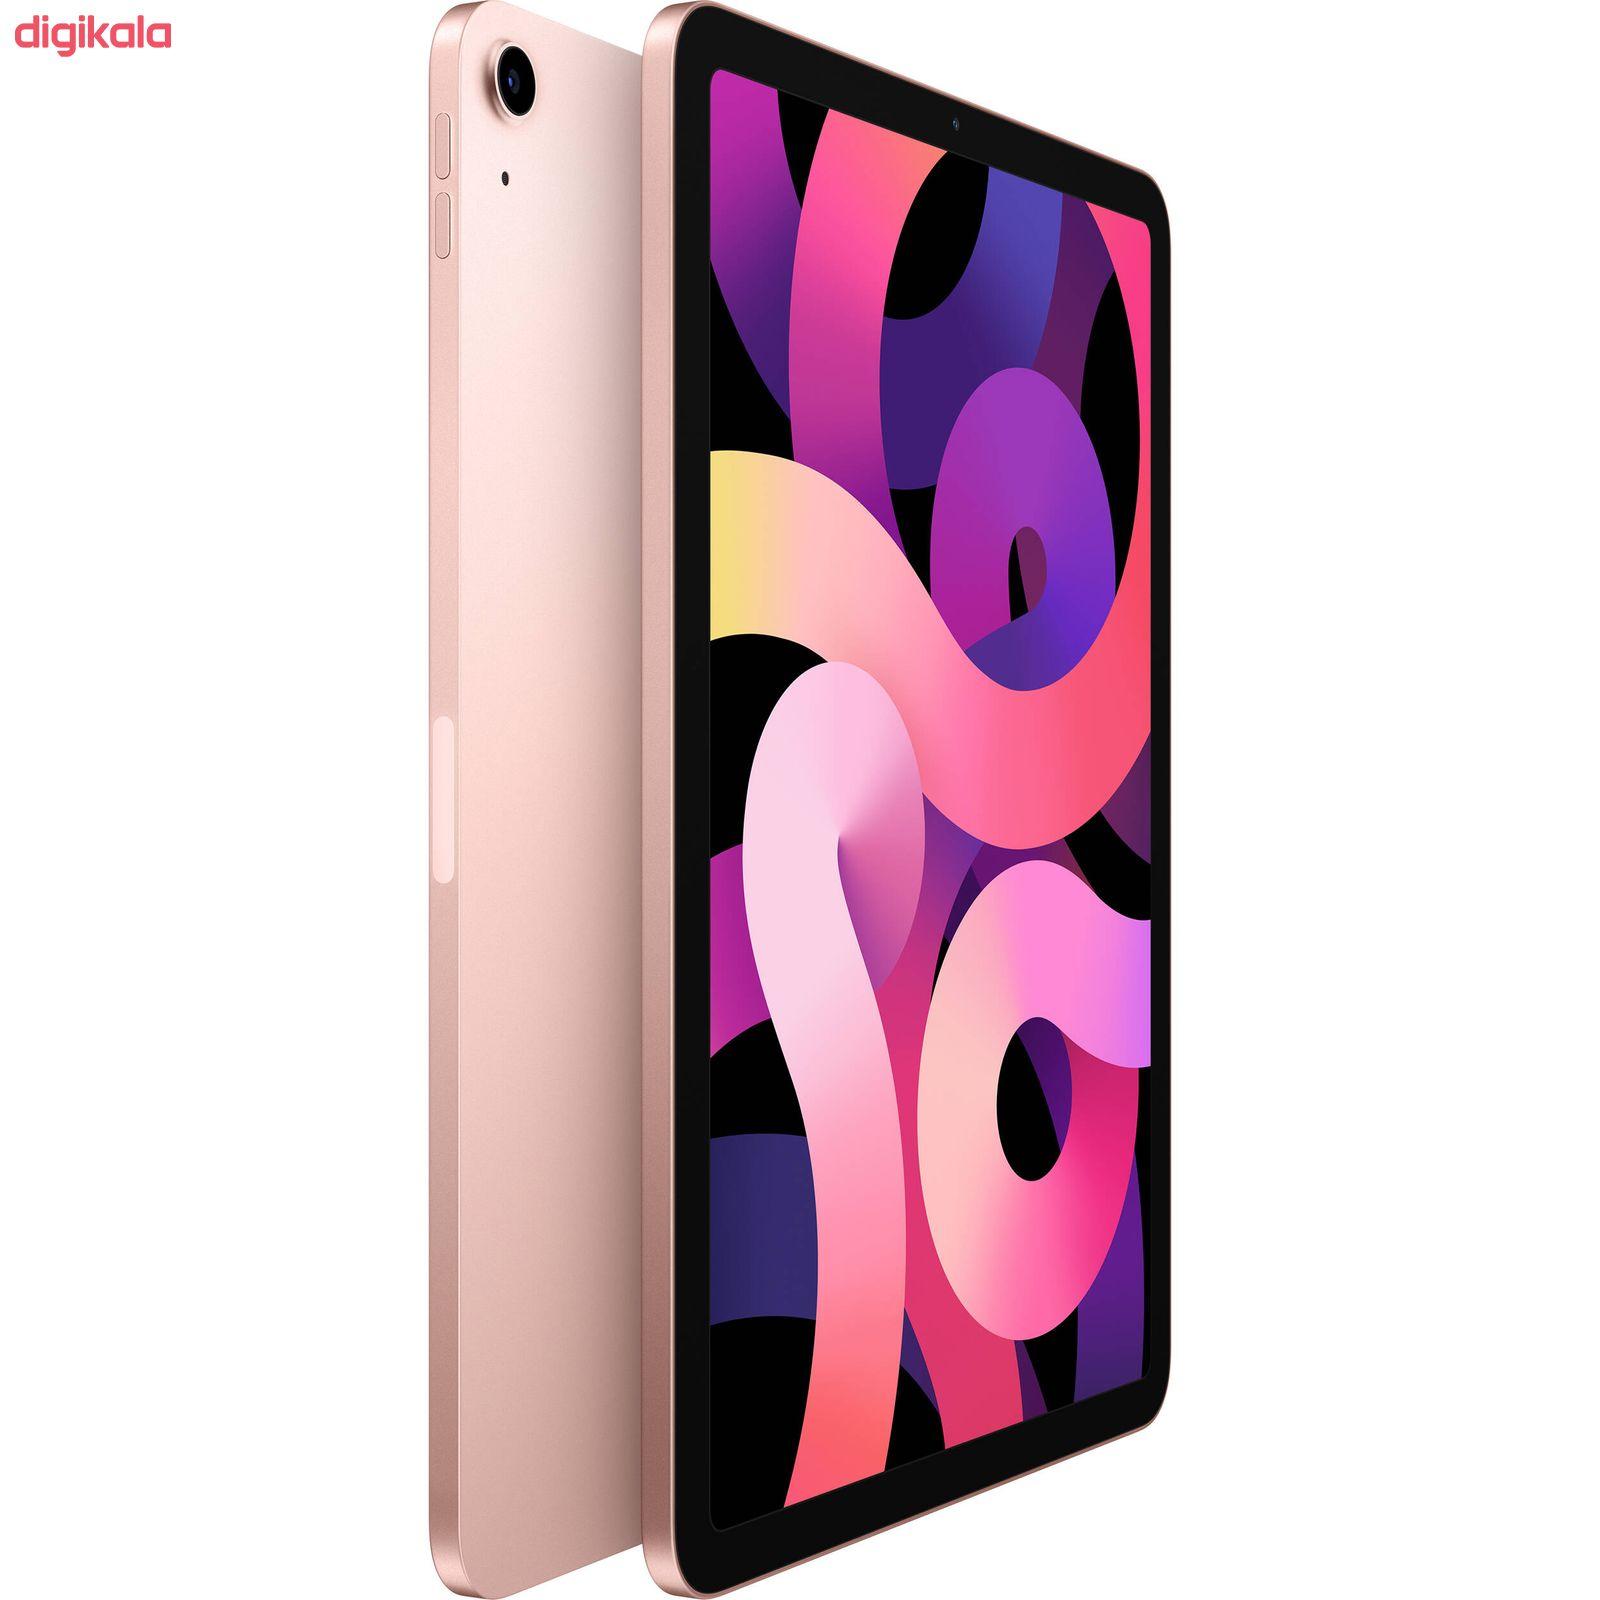 تبلت اپل مدل iPad Air 10.9 inch 2020 WiFi ظرفیت 256 گیگابایت  main 1 11